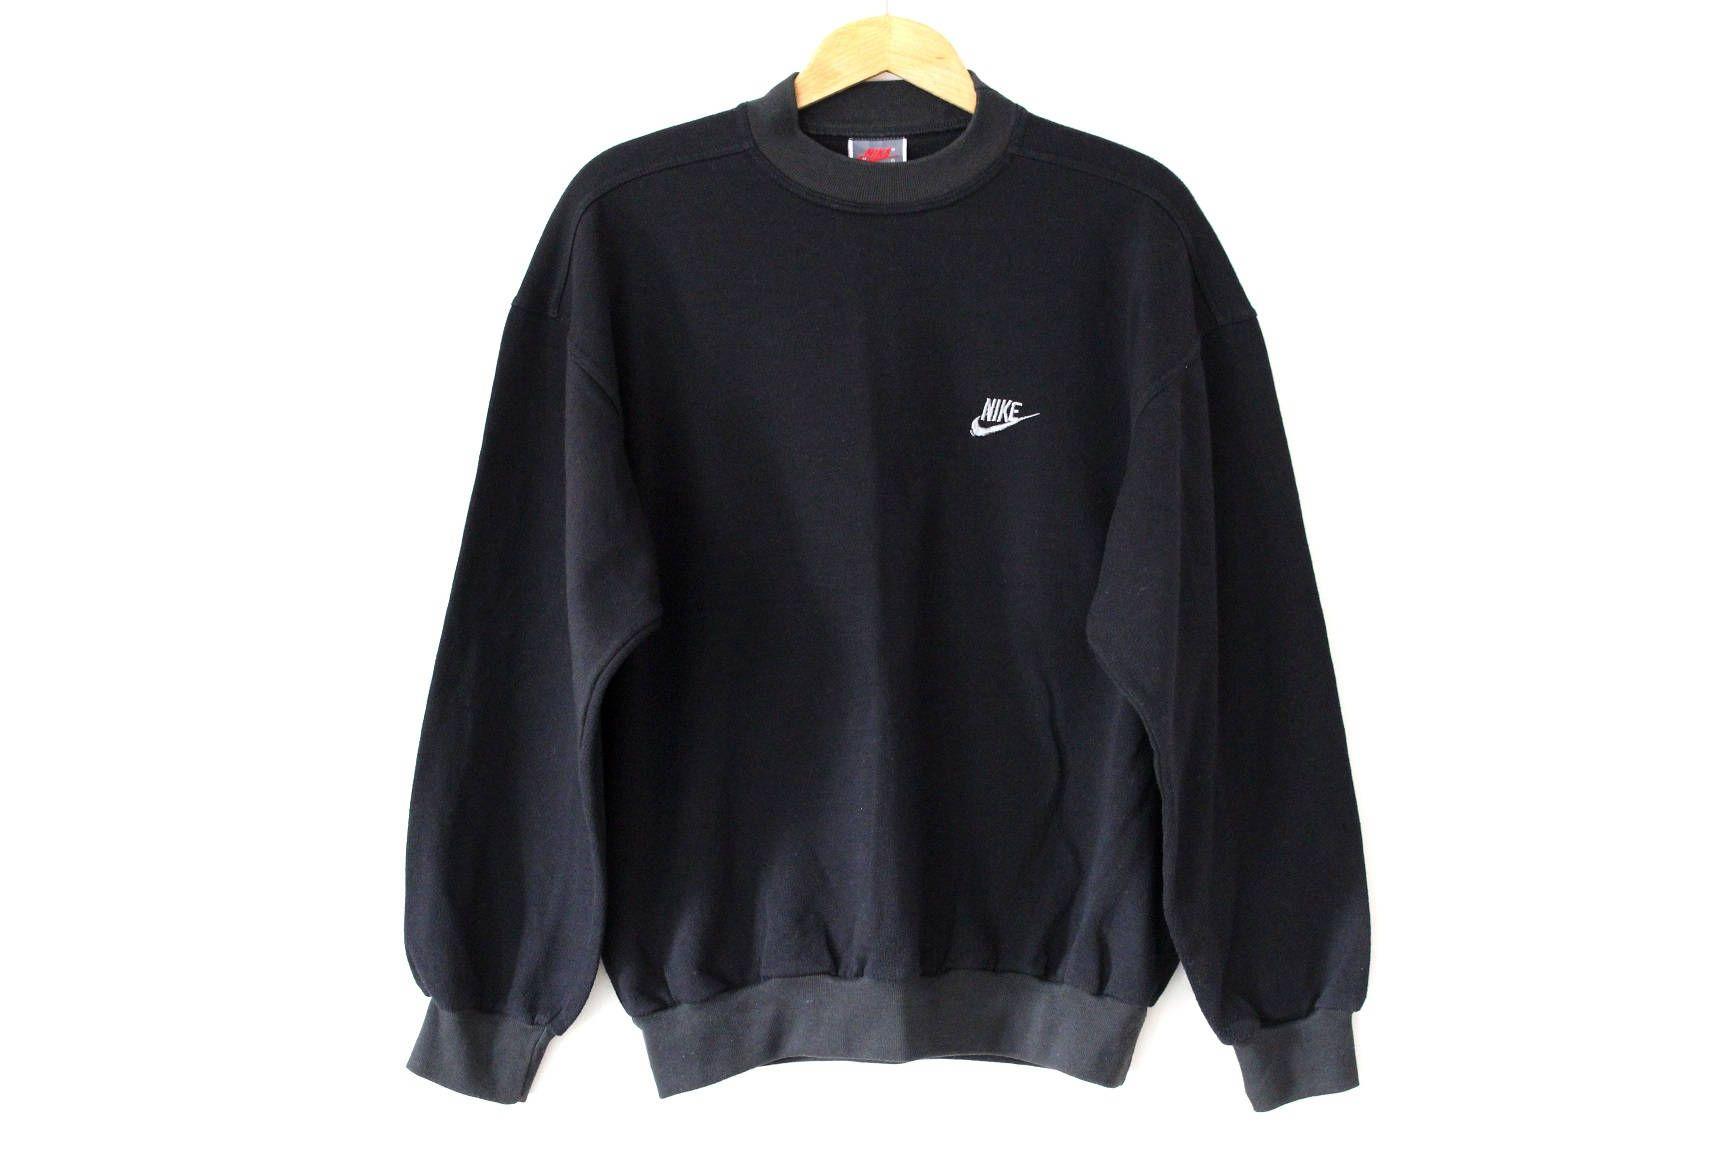 Vintage Nike Sweatshirt 80 S Sportswear Black Hip Hop Streetwear Rare Sweater Pullover Jumper Nike Usa Oregon Made In Greece Track Top Vintage Nike Sweatshirt Nike Sweatshirts 80s Sportswear